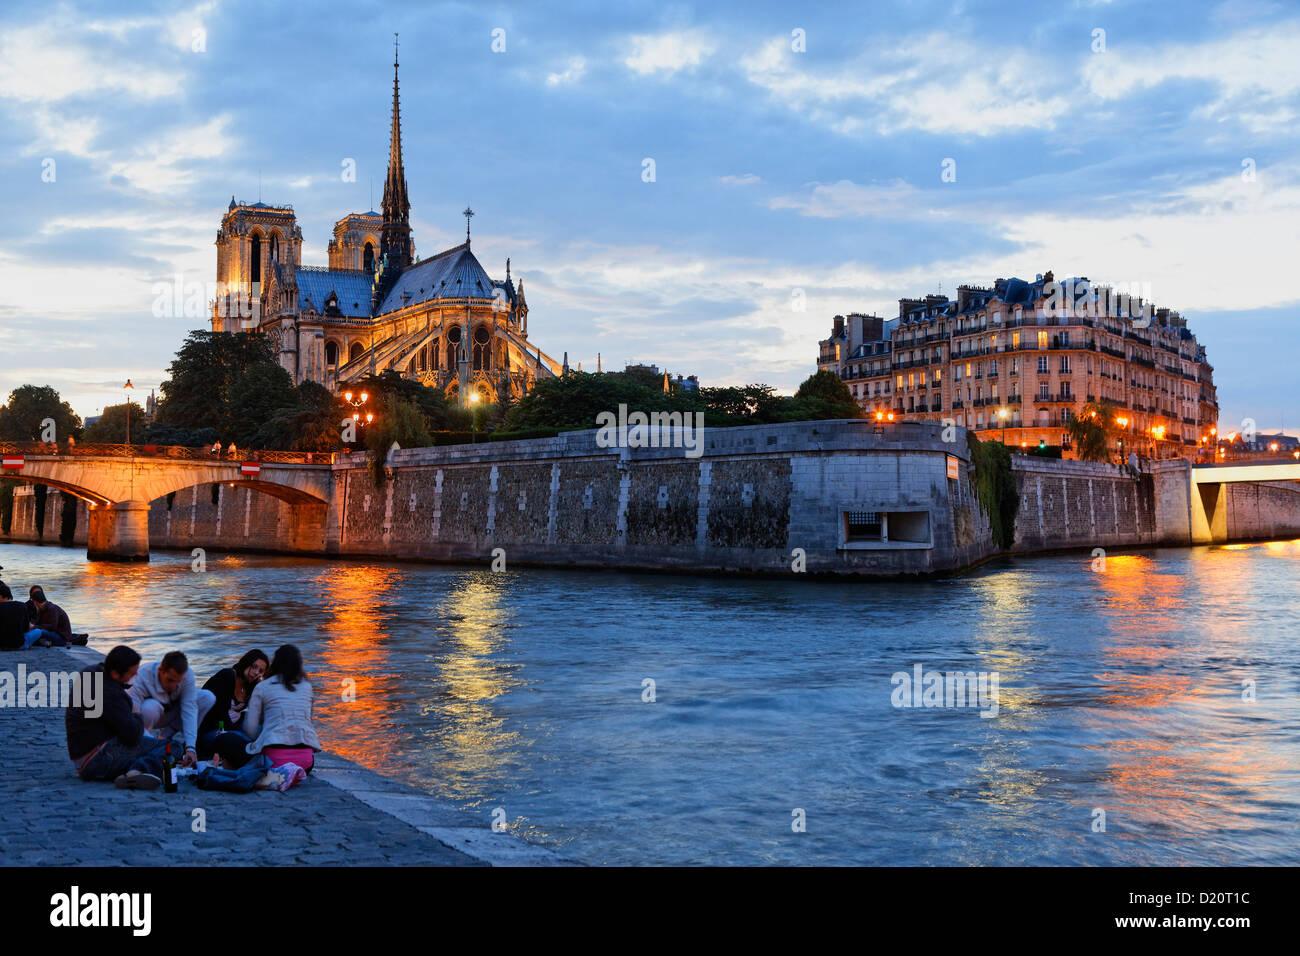 Ile de la Cite, Seine and Notre Dame in the evening, Paris, France, Europe - Stock Image